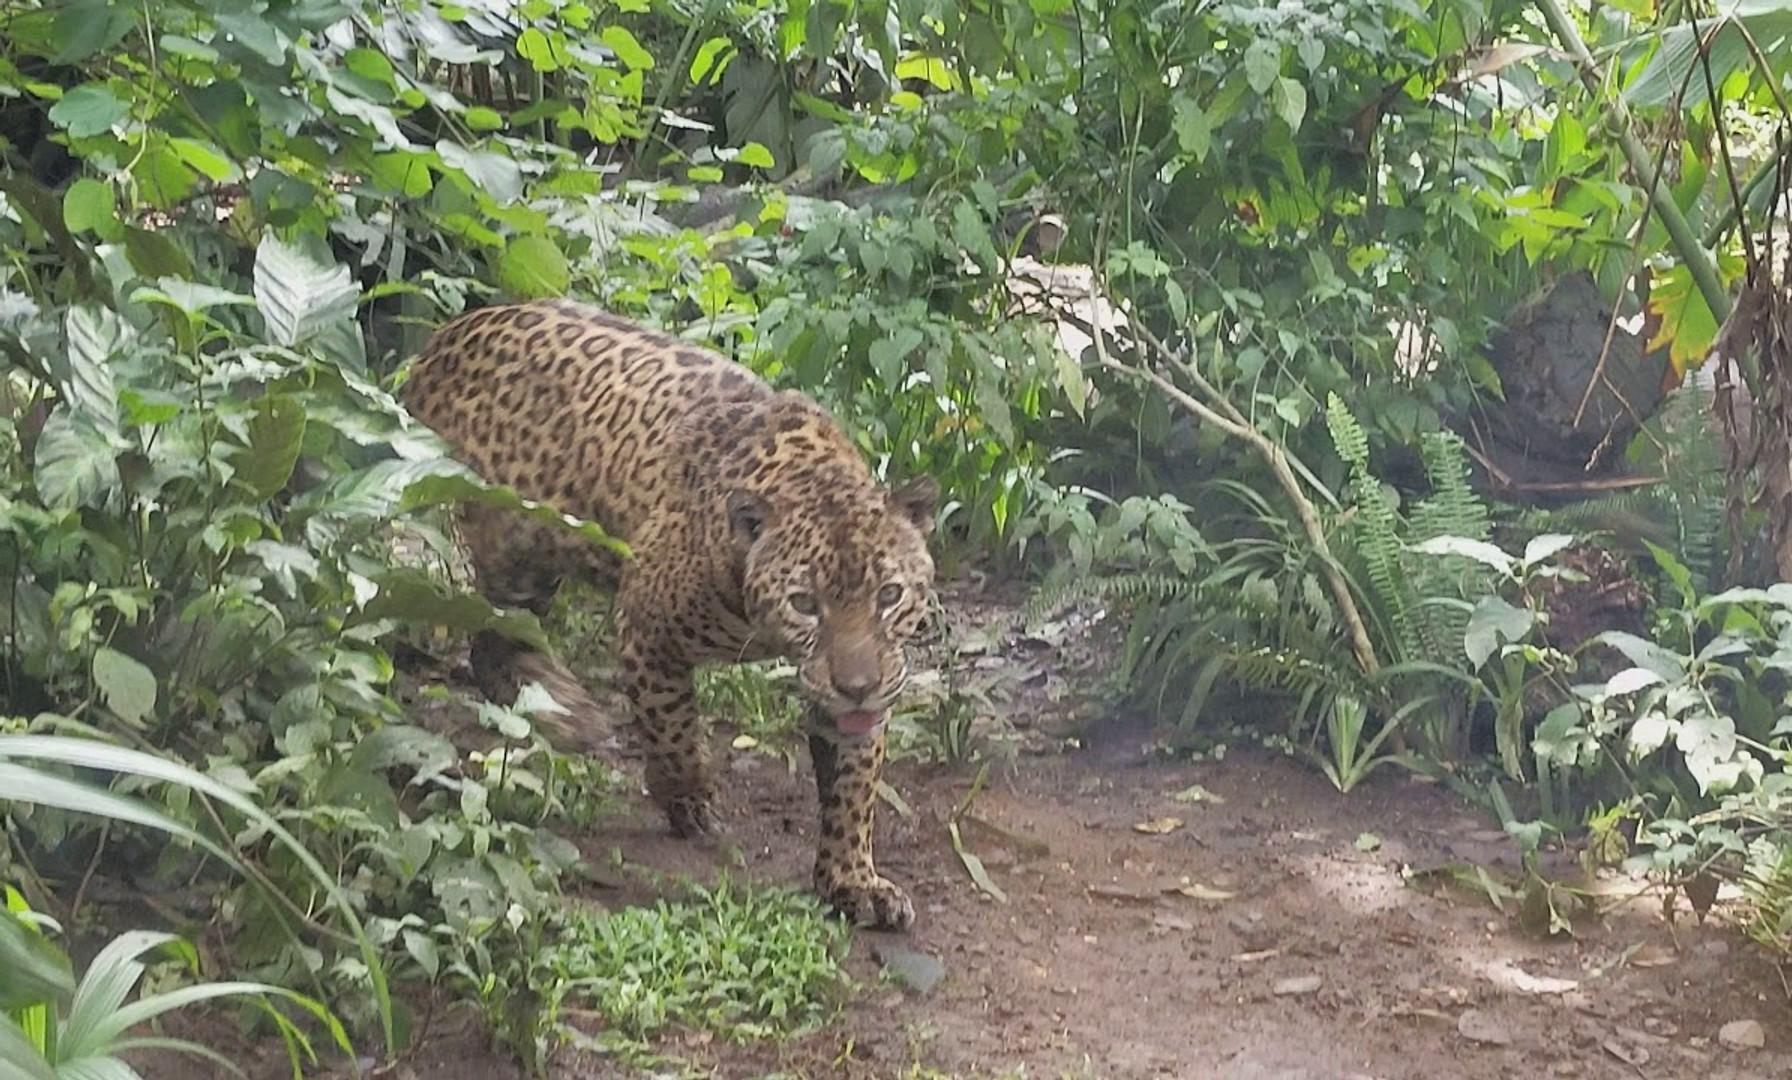 Jaguar Stalks Me at Parque Zoologico Bolivar in San Jose, Costa Rica